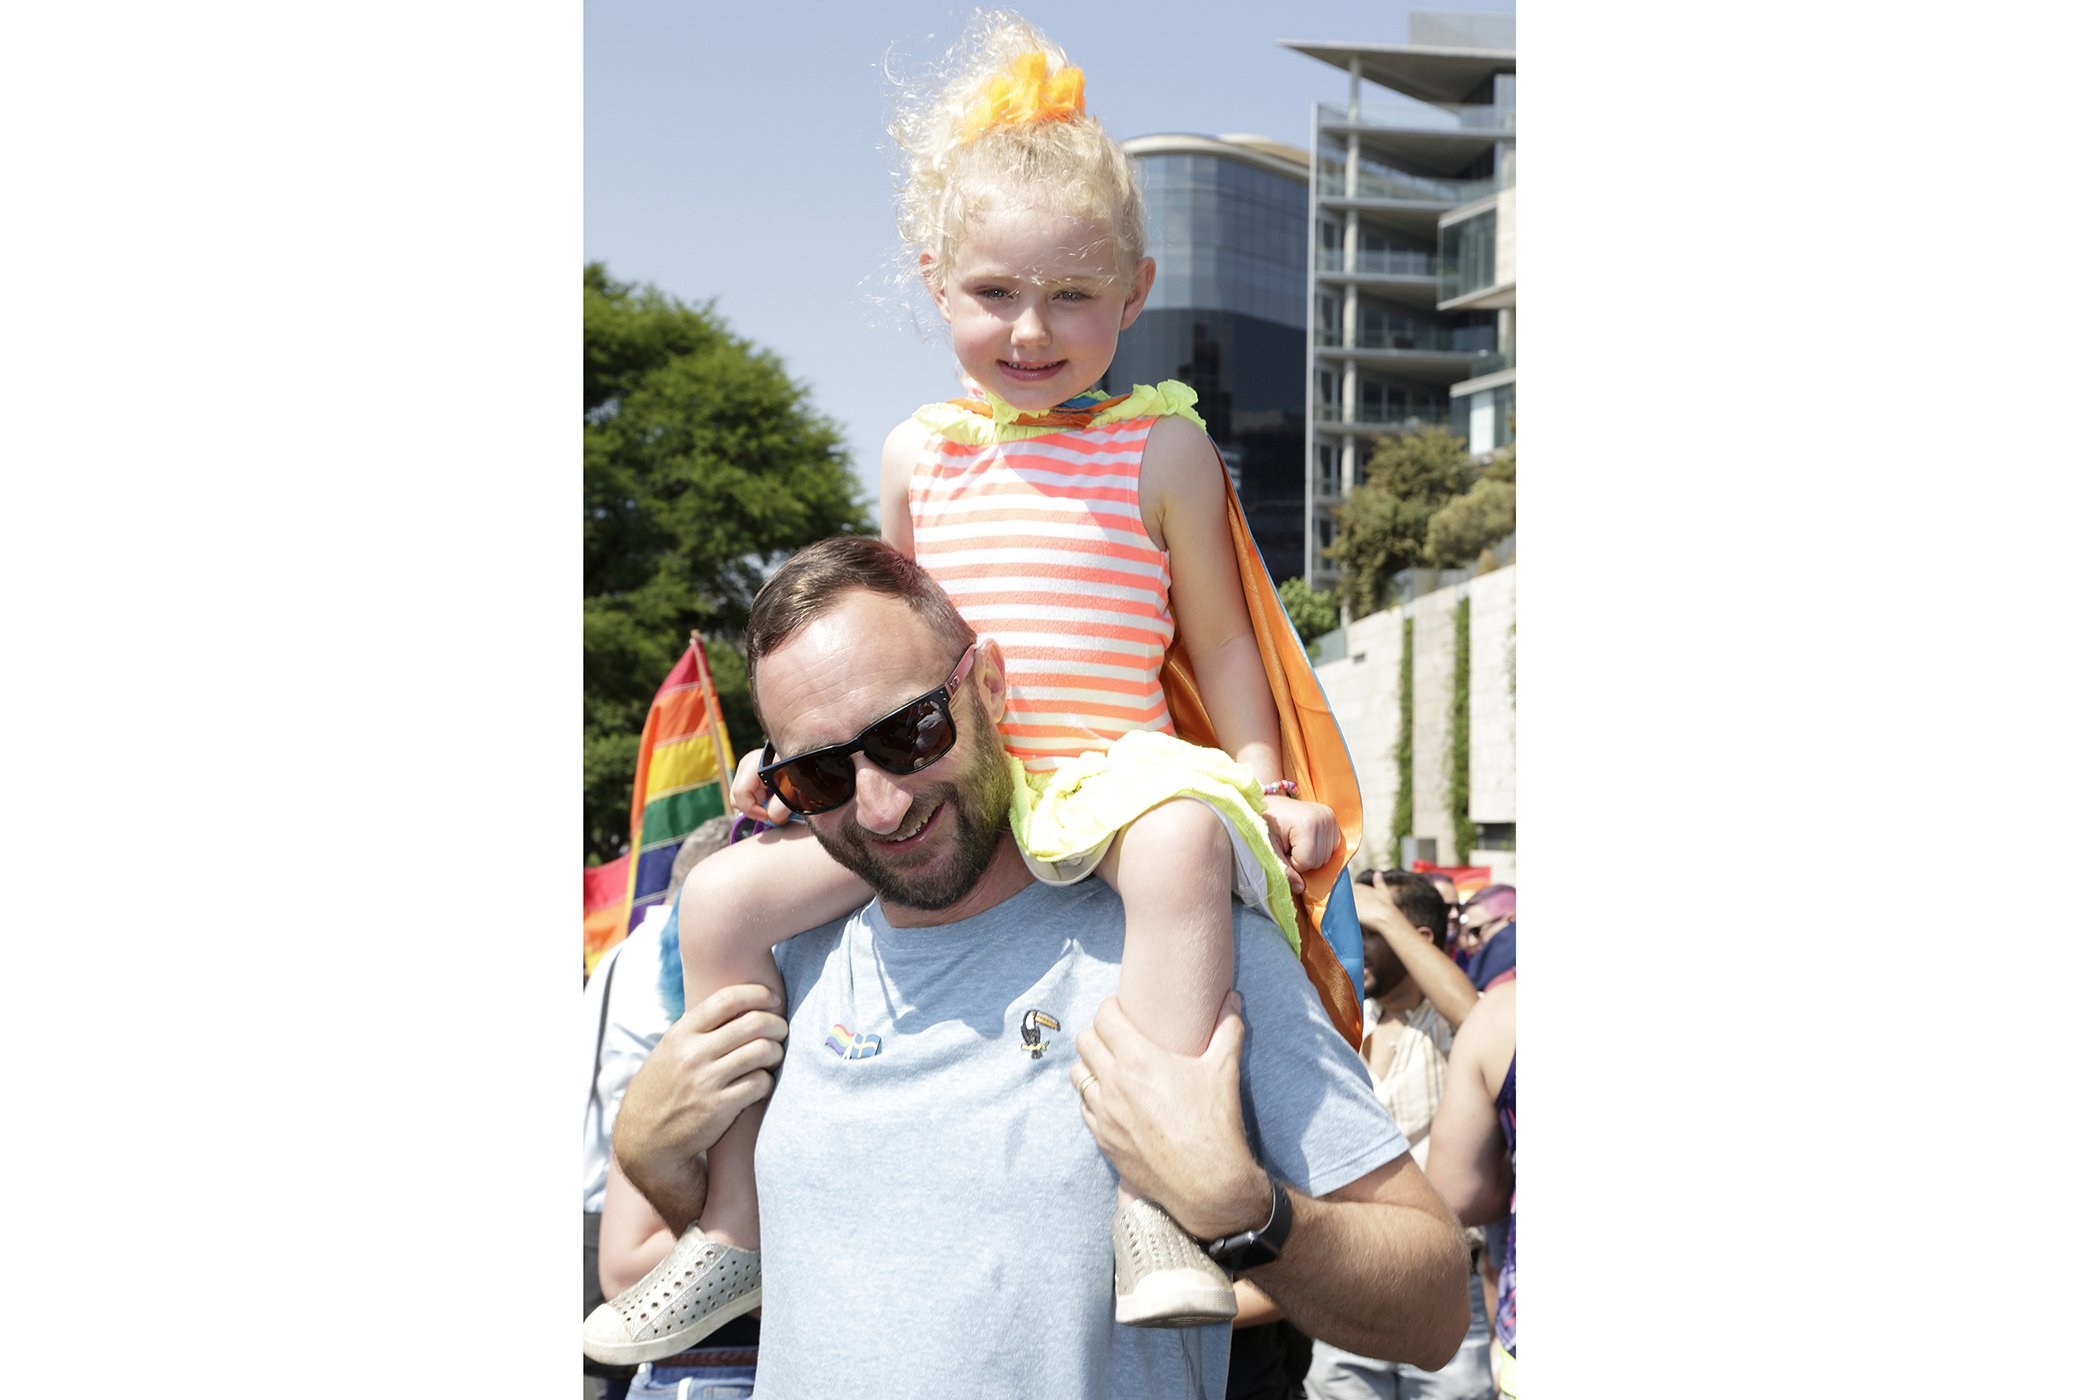 Johannesburg_Pride_LGBTQ_Noncedo Gxekwa_004-FULL.jpg